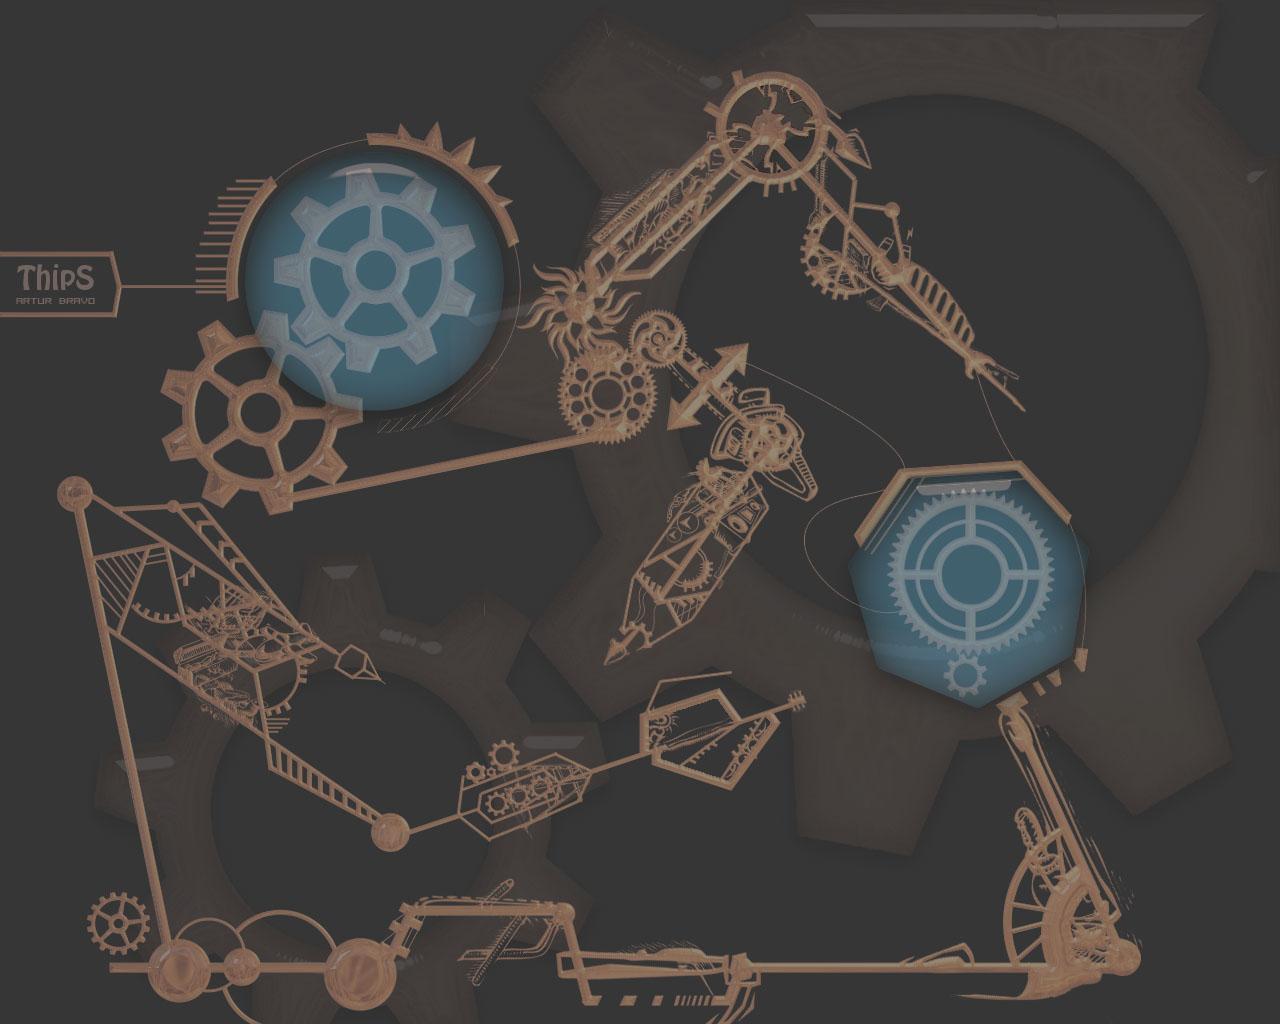 47+ Mechanical Engineering Wallpaper on WallpaperSafari